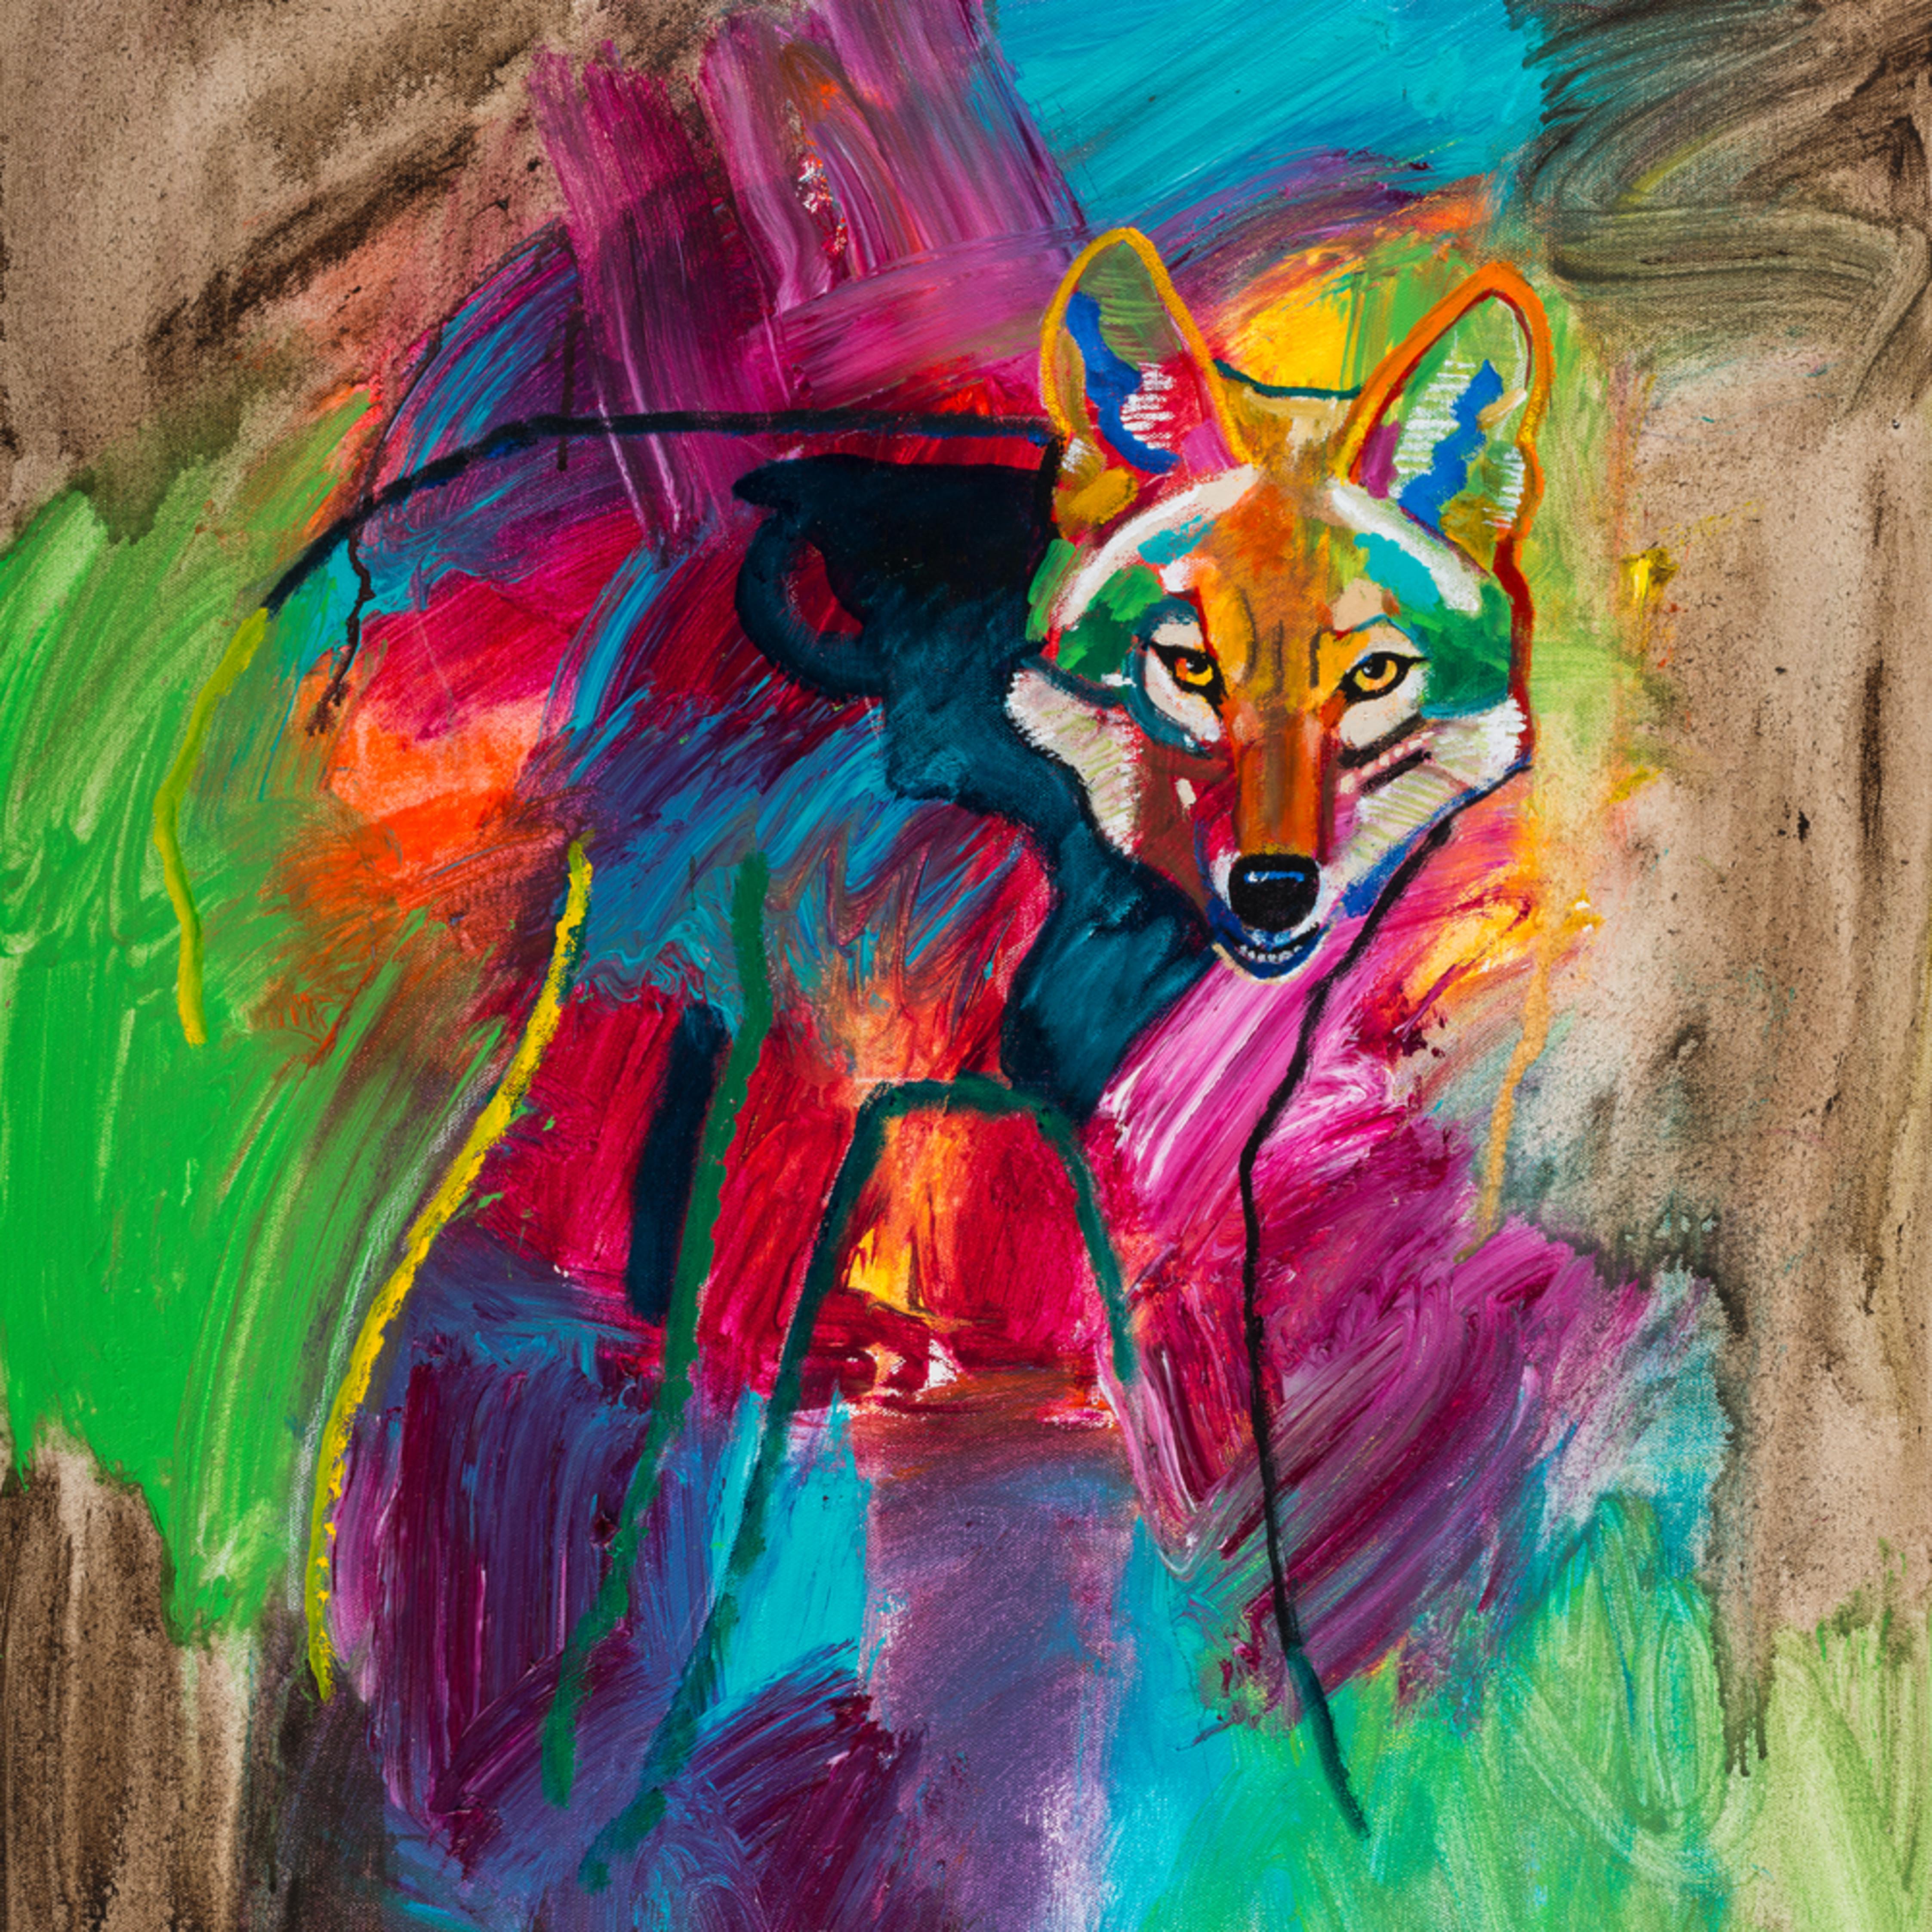 Coyote emerging 004 kylshh